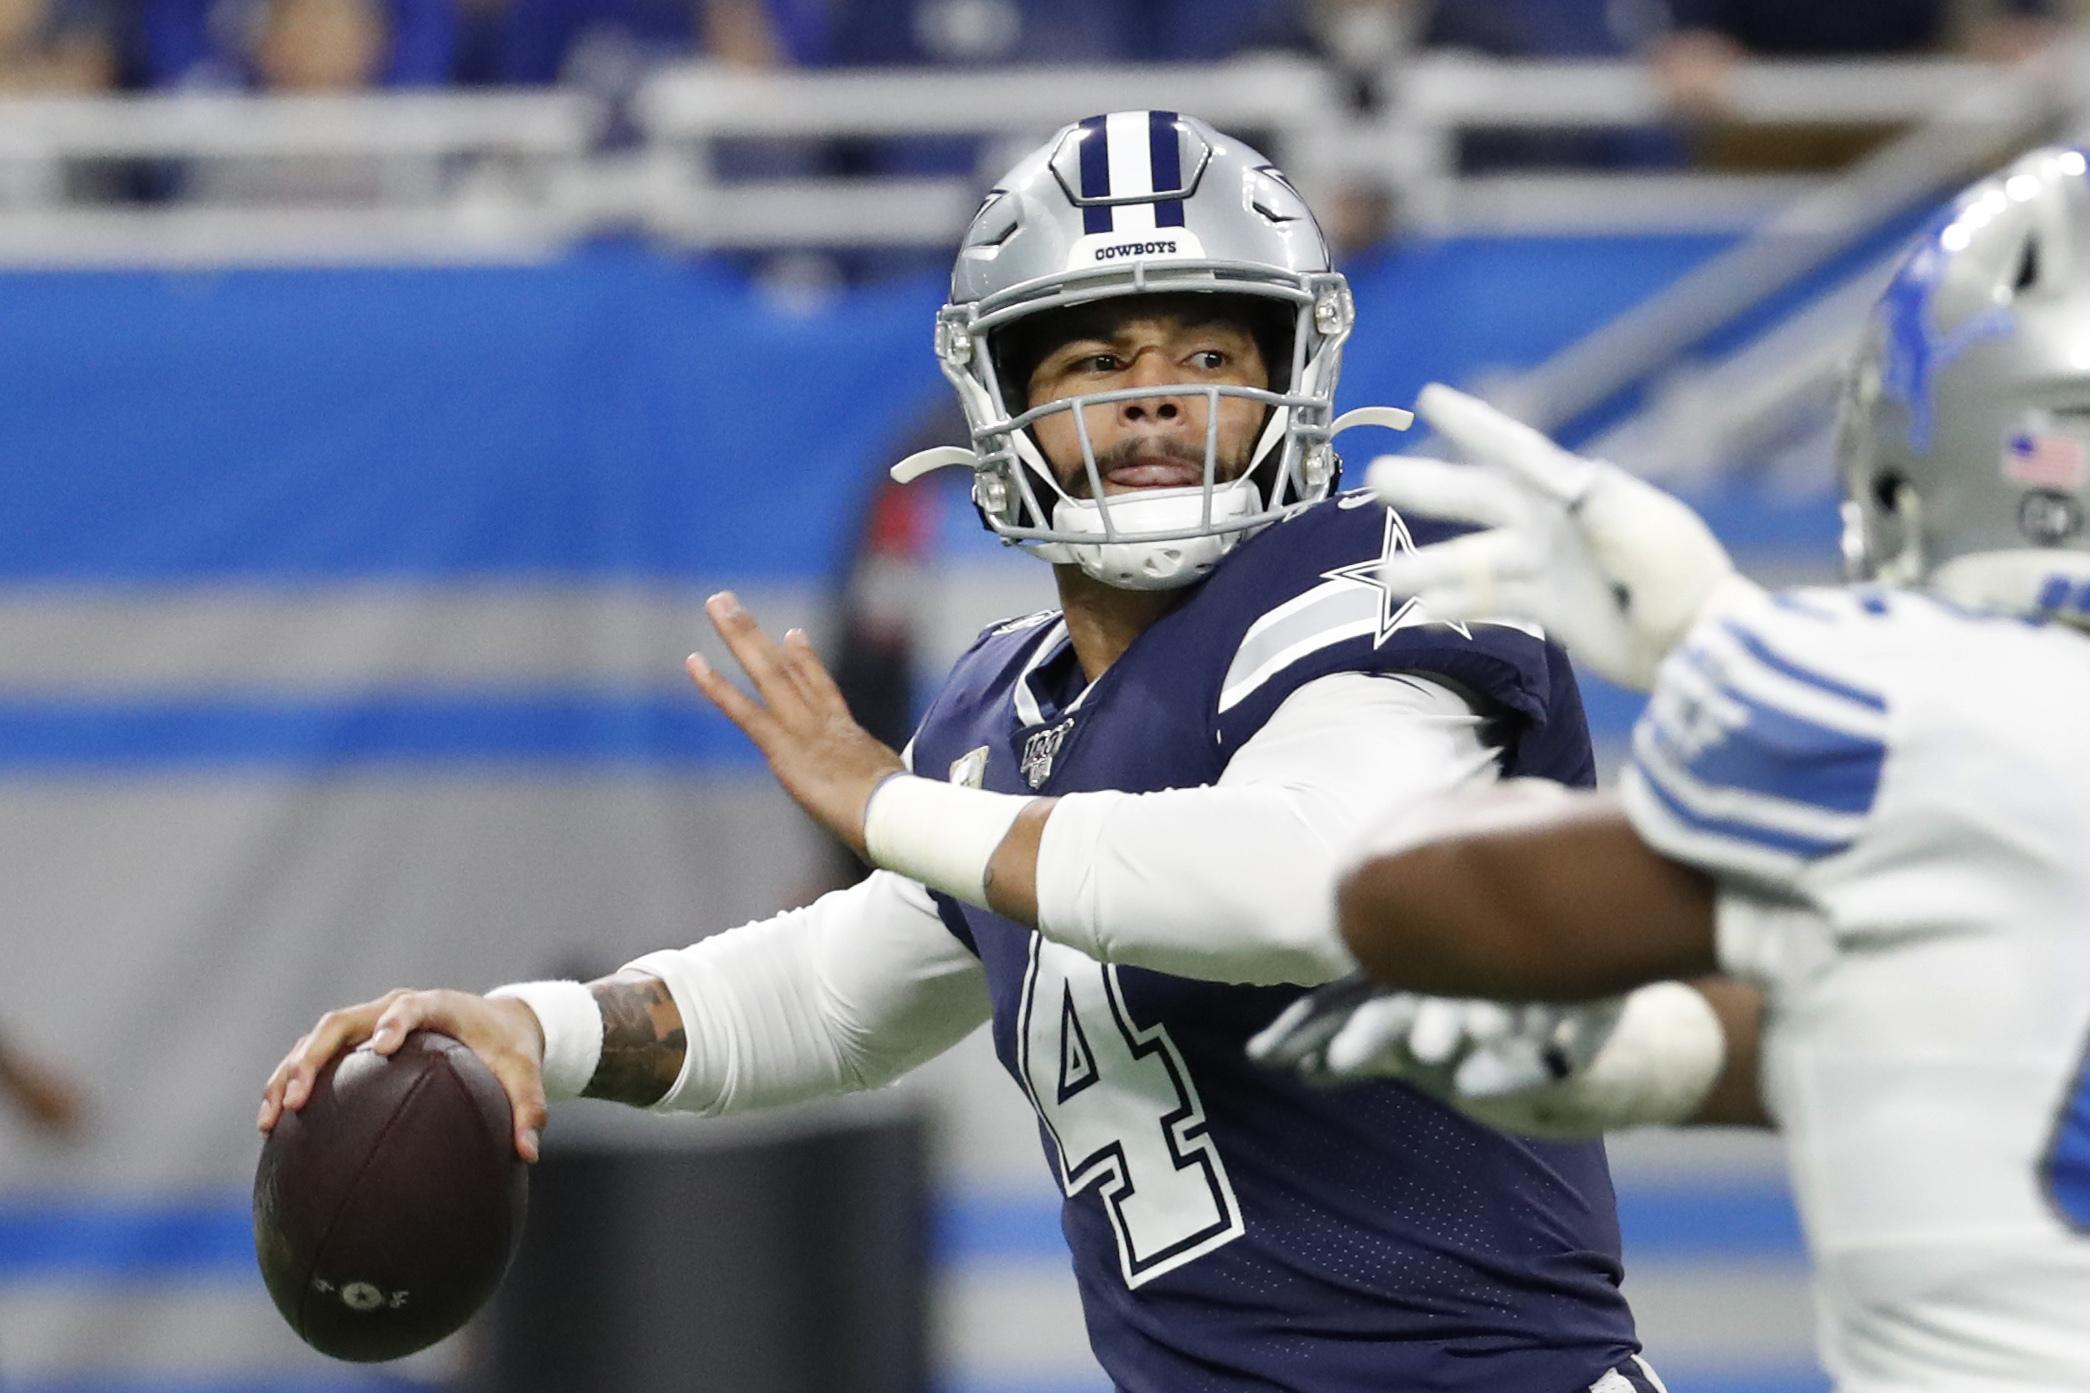 Cowboys Patriots Preview Can Dallas Change Recent History